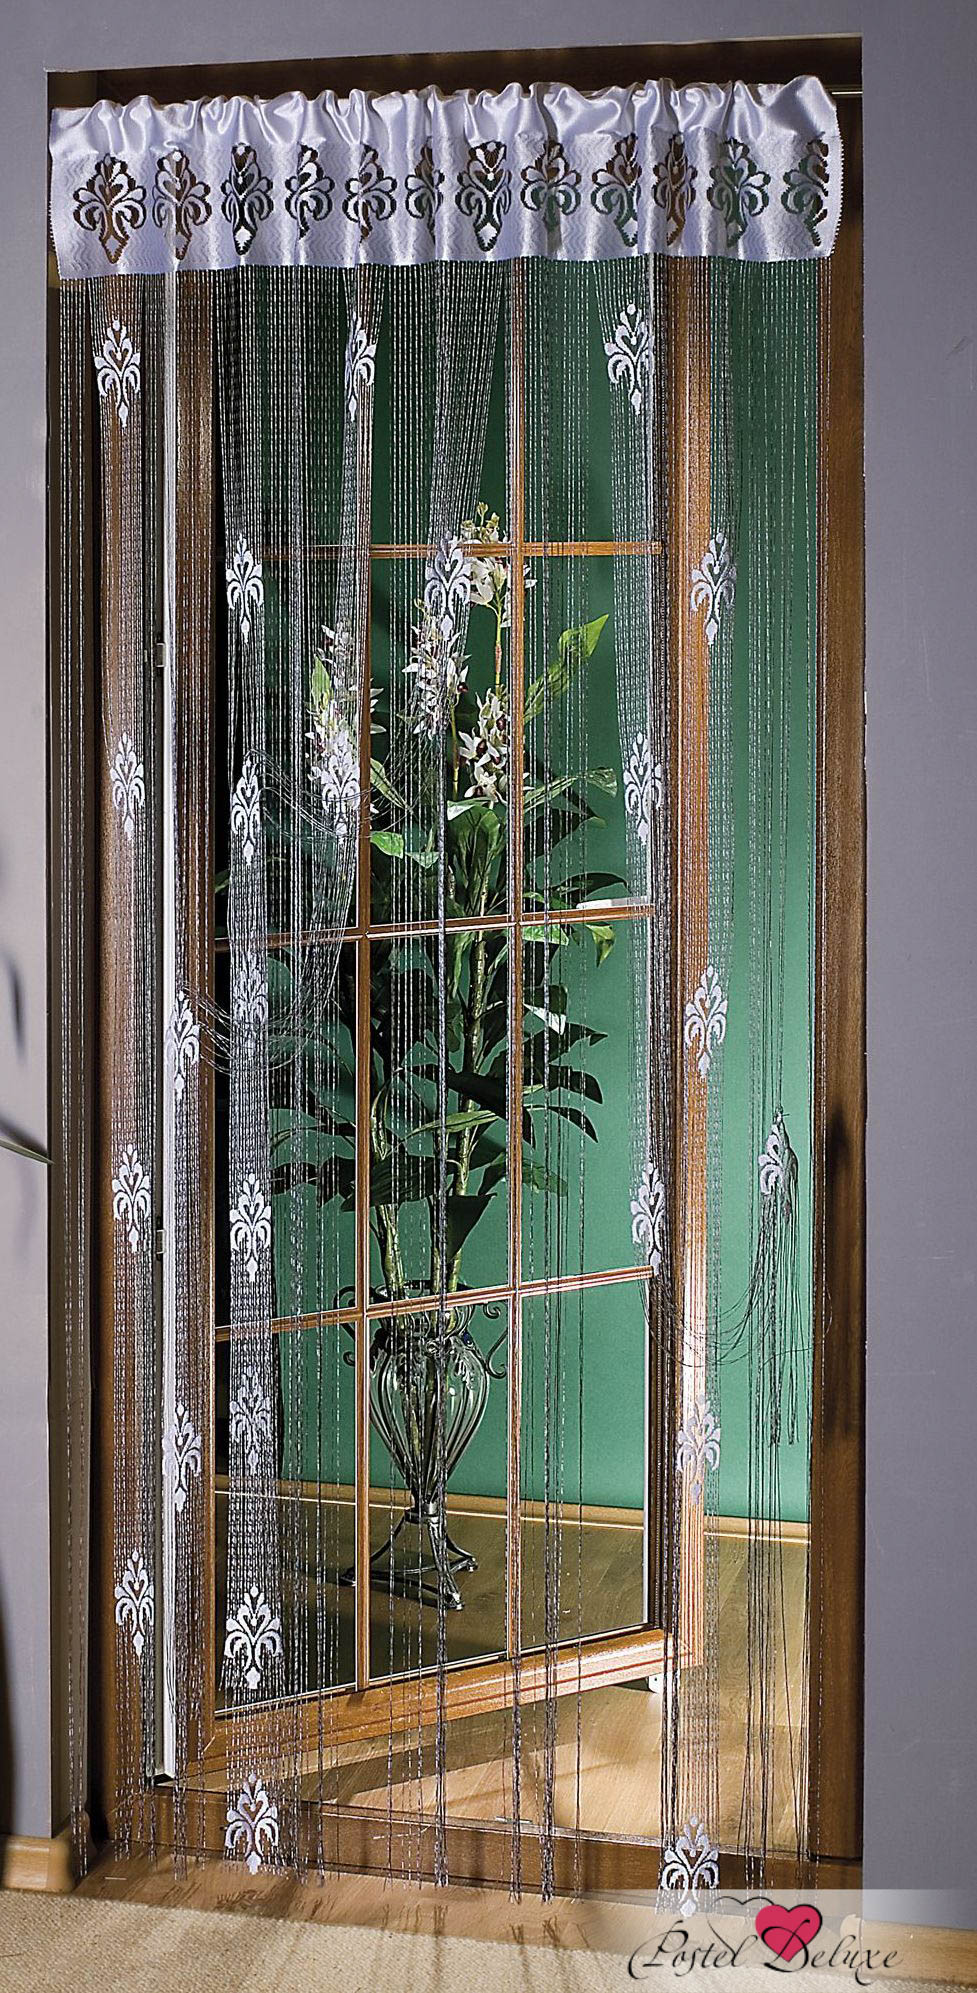 Шторы Wisan Нитяные шторы Joshua Цвет: Серебро wisan wisan нитяные шторы joelle цвет кремовый бежевый